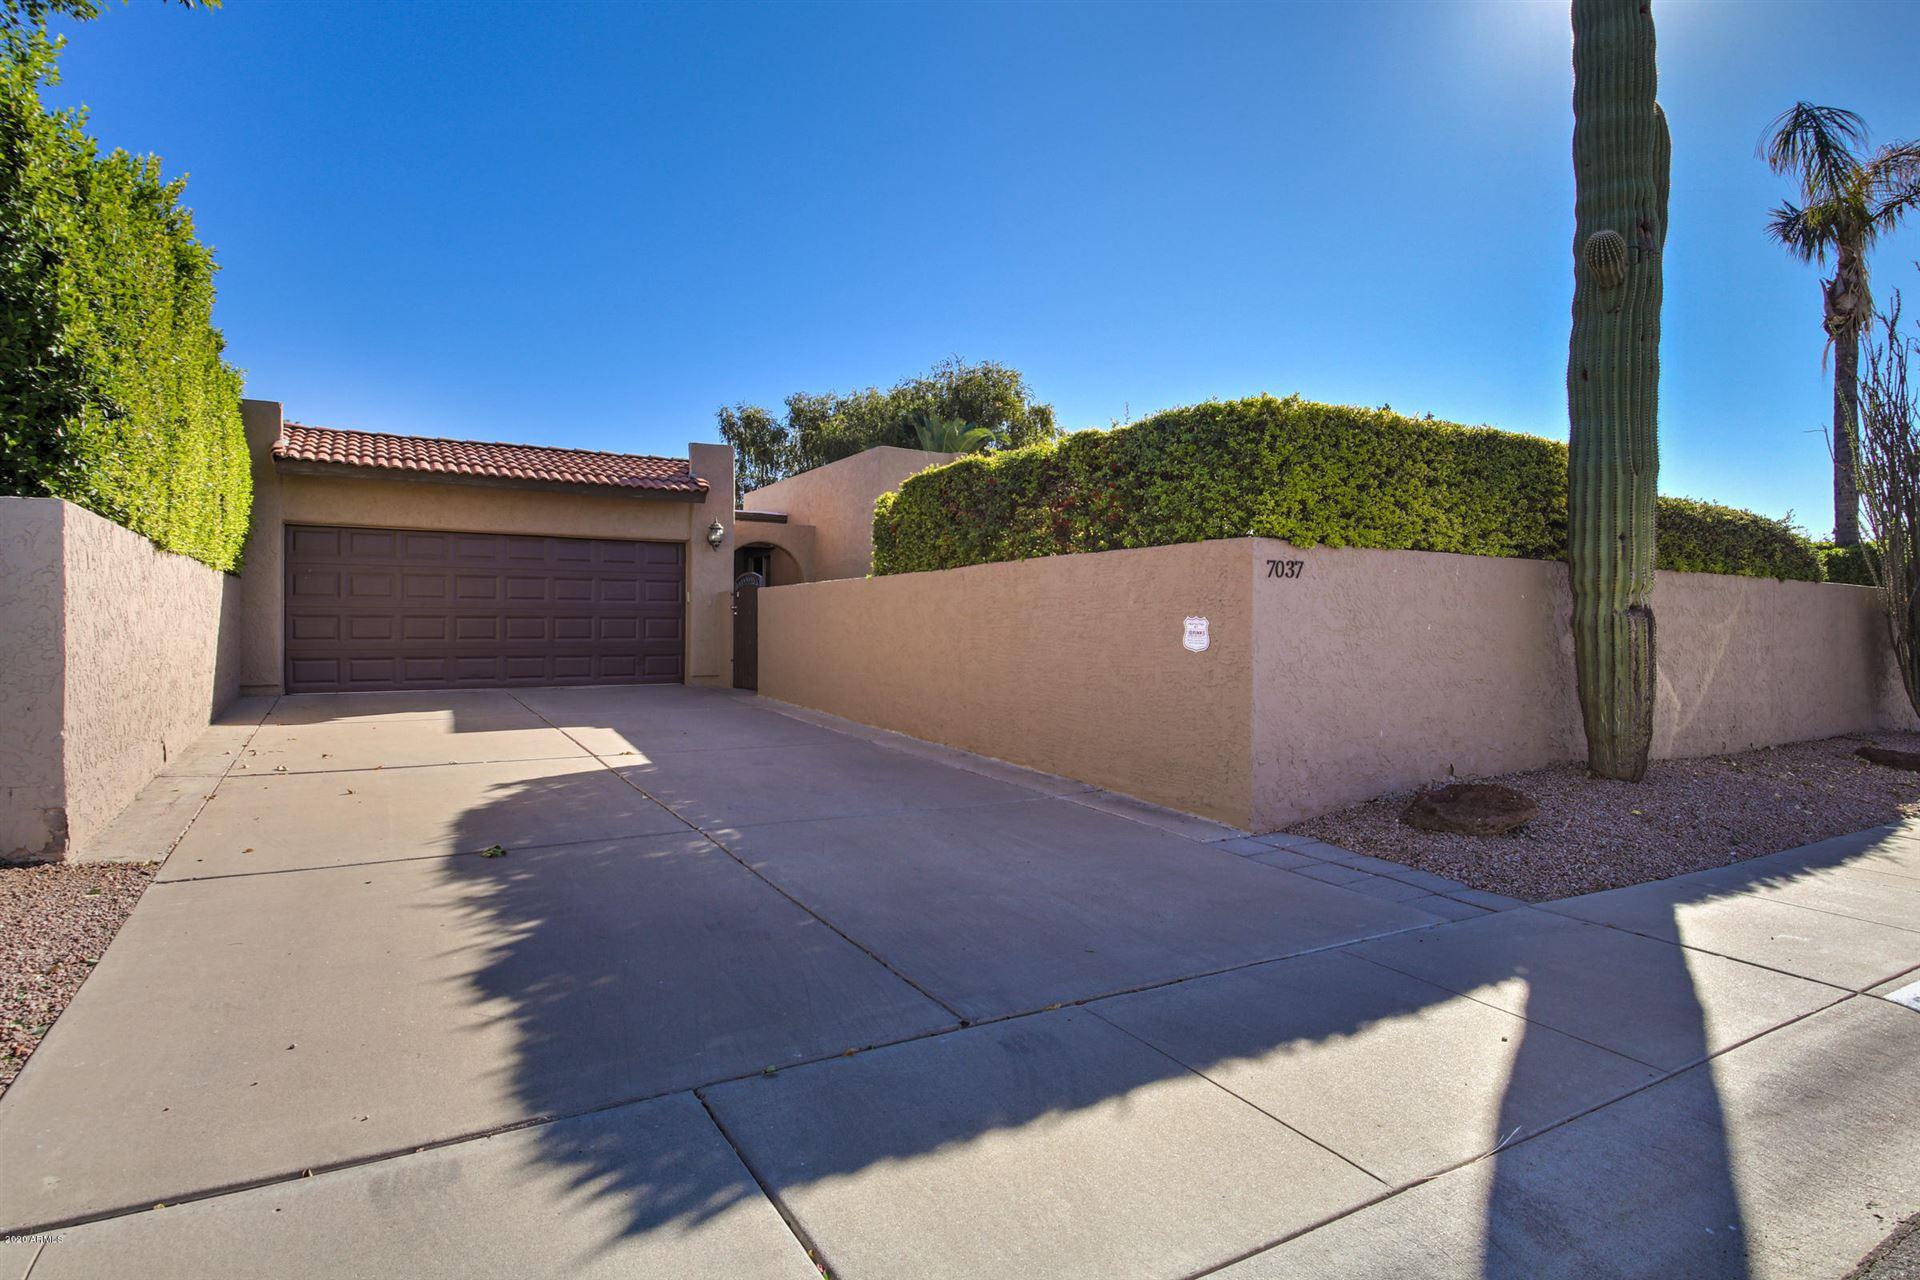 7037 N VIA DE PAESIA --, Scottsdale, AZ 85258 - MLS#: 6167797